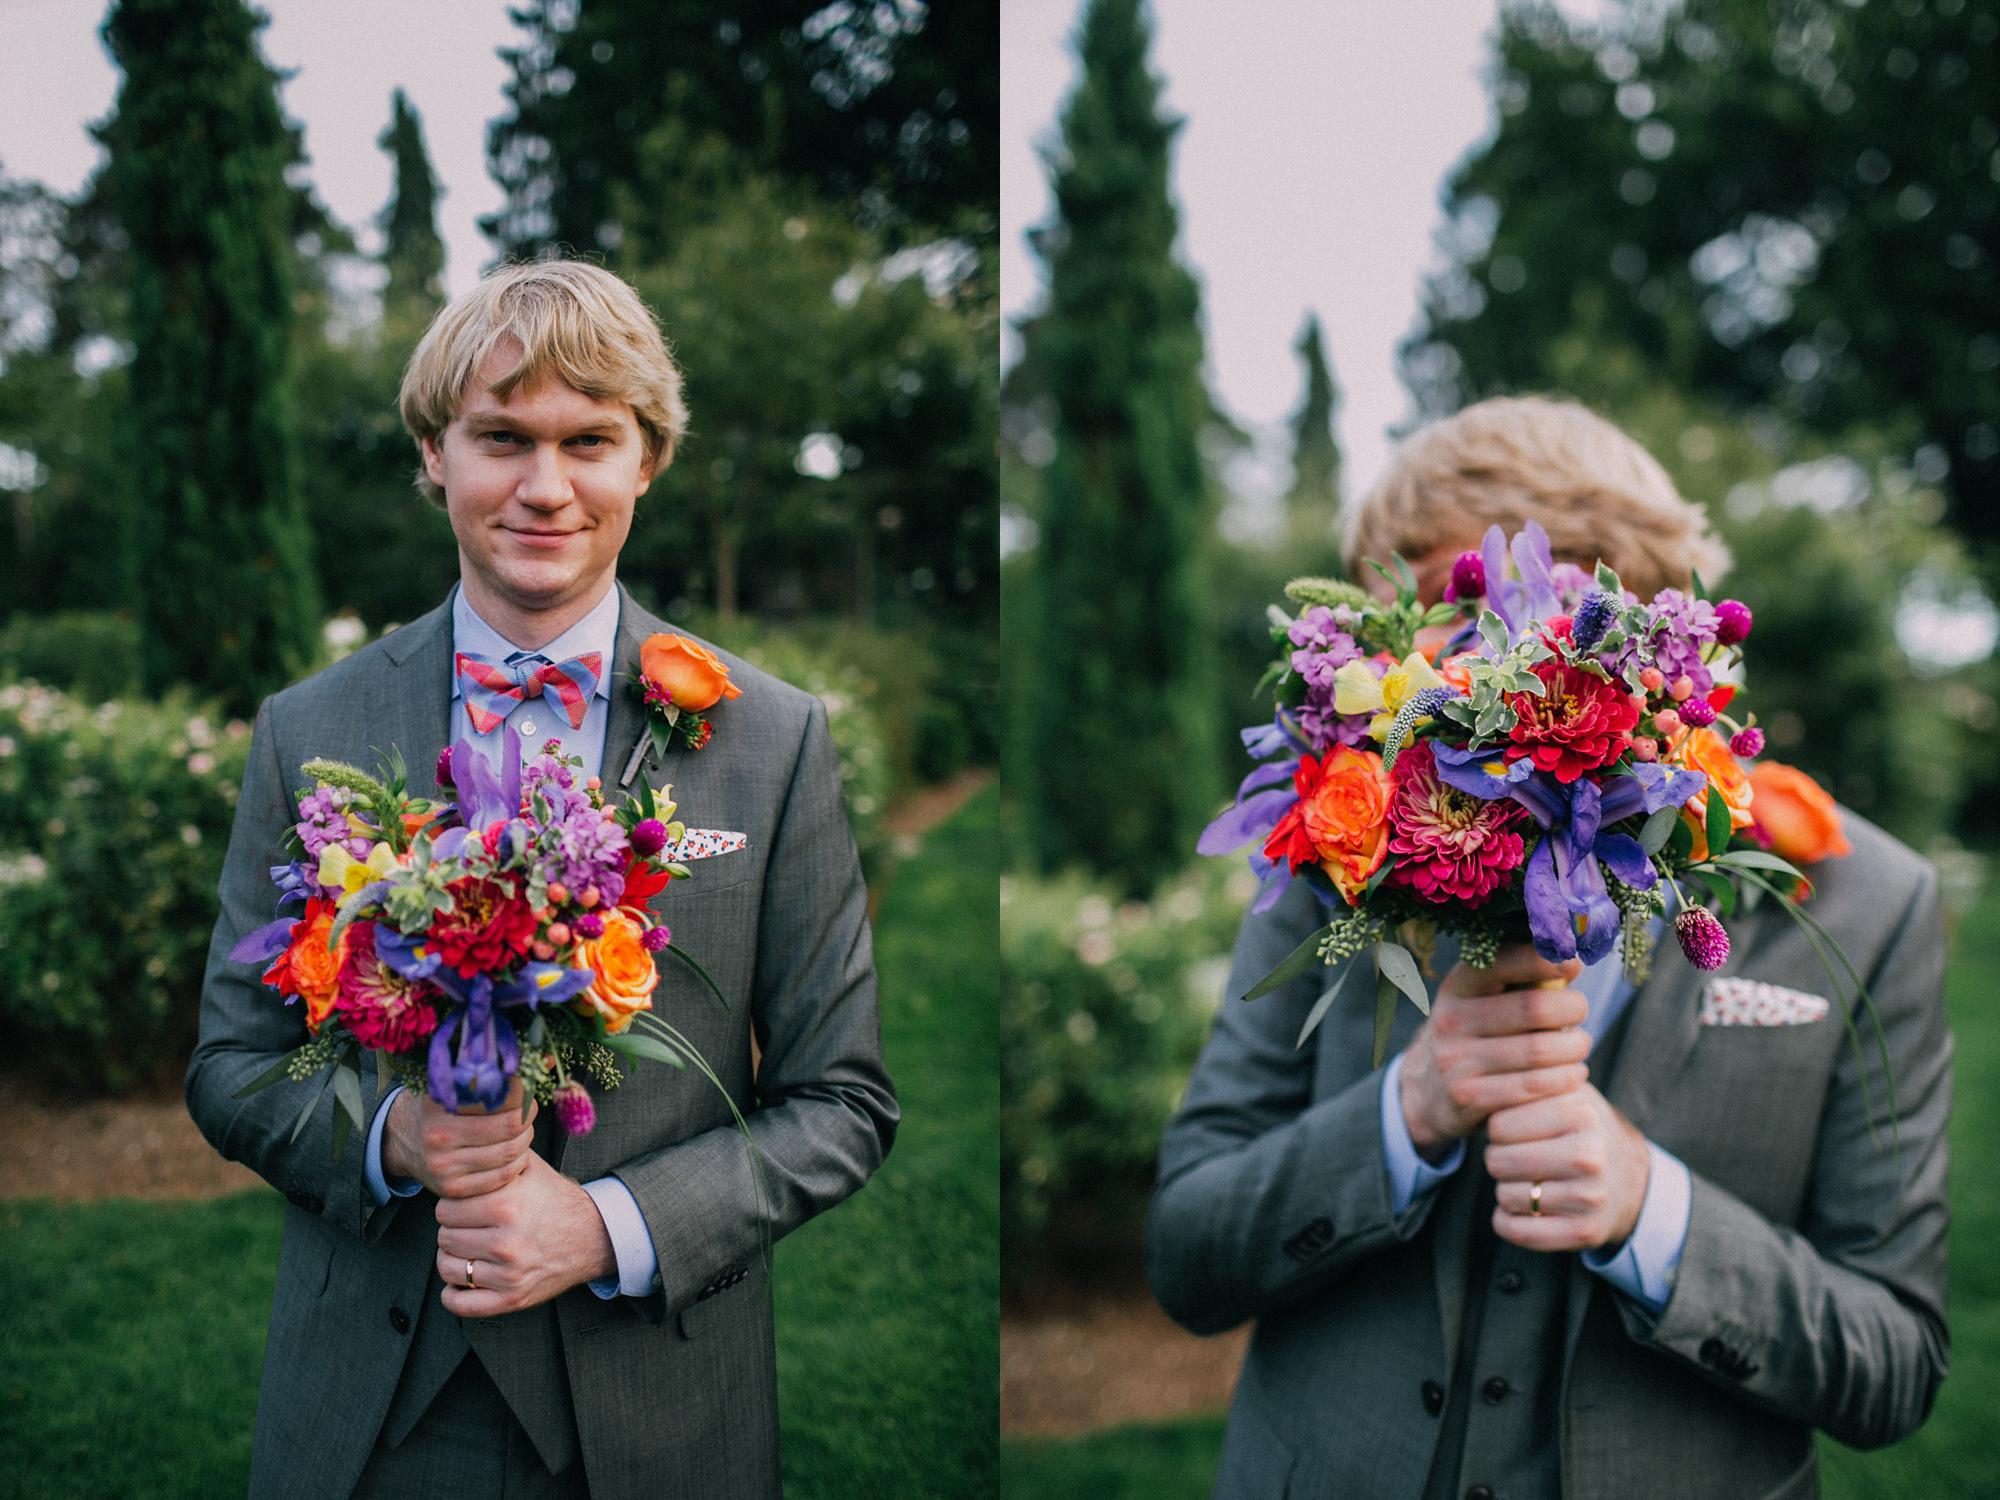 seattle wedding photographer and courthouse elopement photography washington -12.jpg